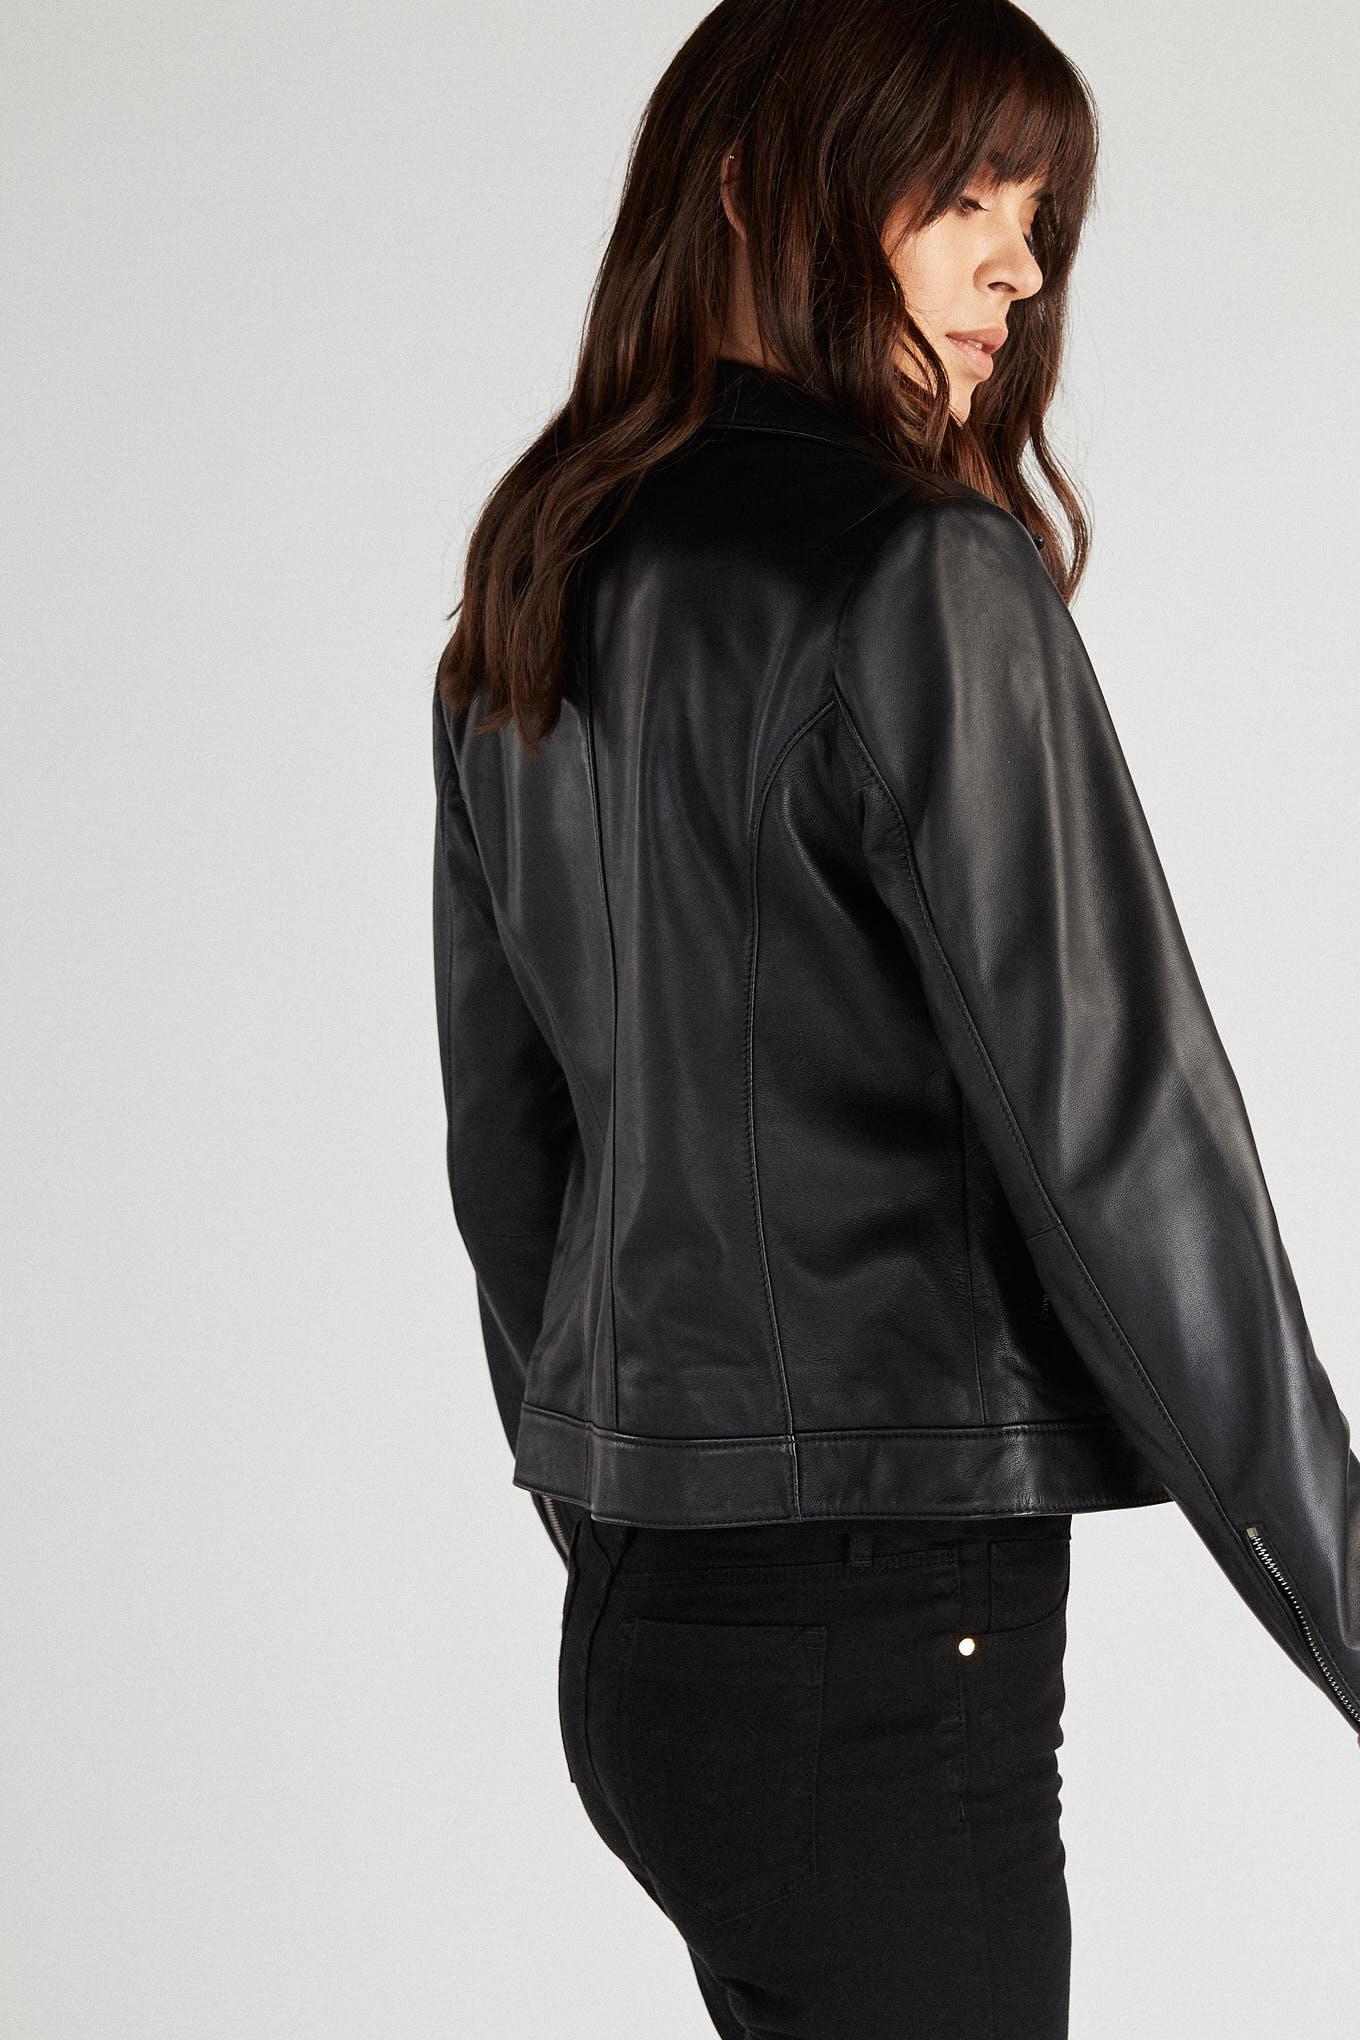 Leather Jacket Black Sport Woman